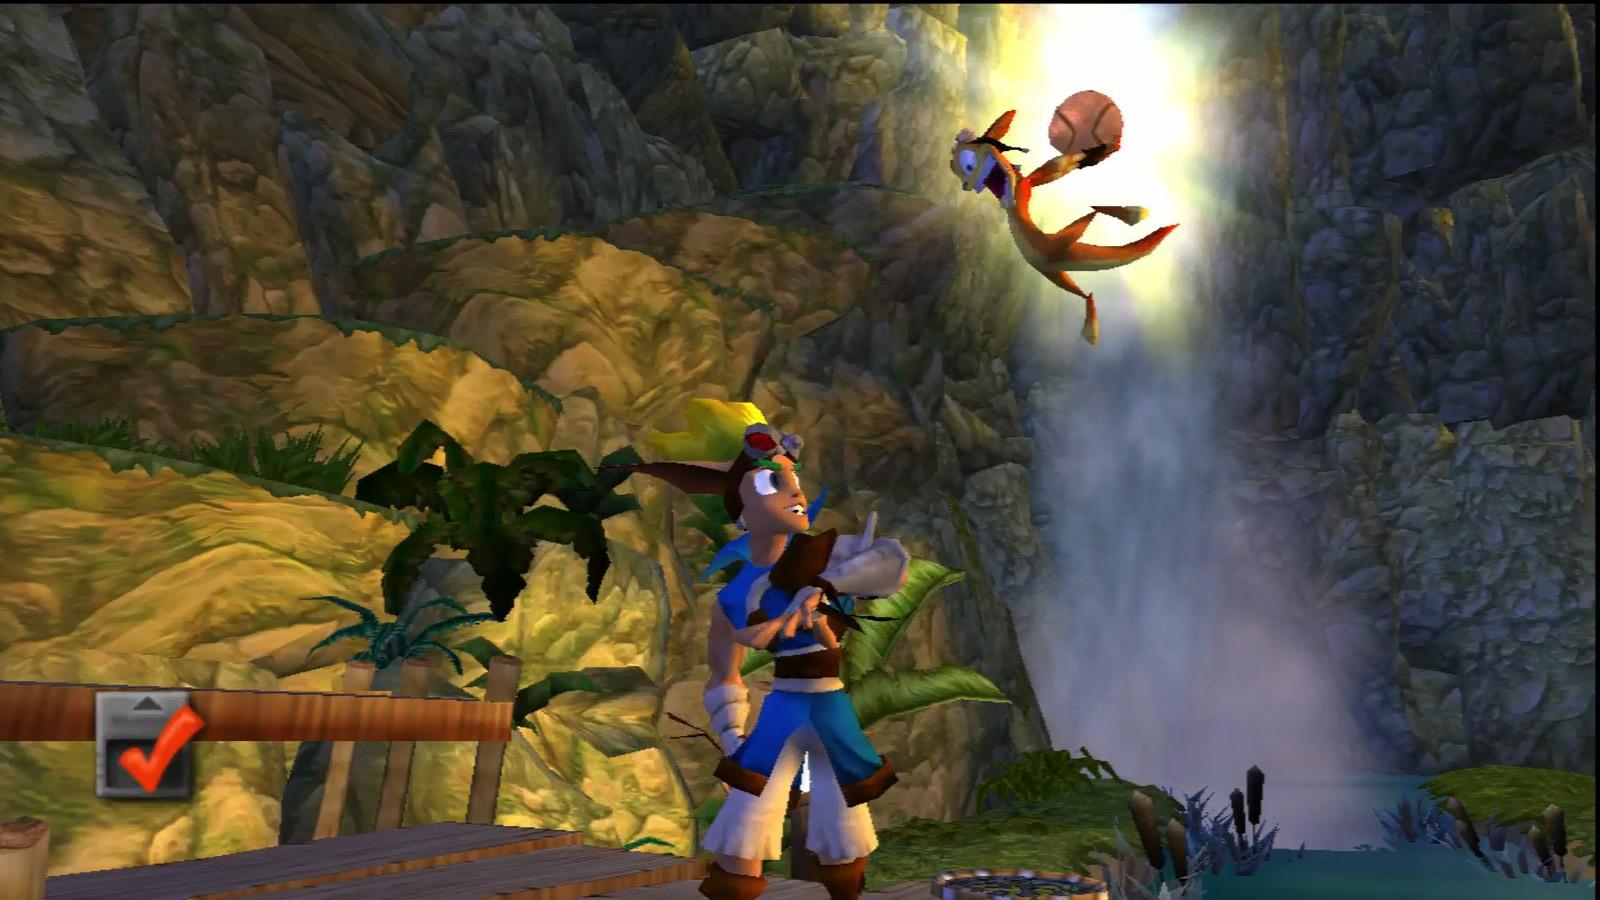 Jak Daxter The Precursor Legacy Hd Review Console Hq